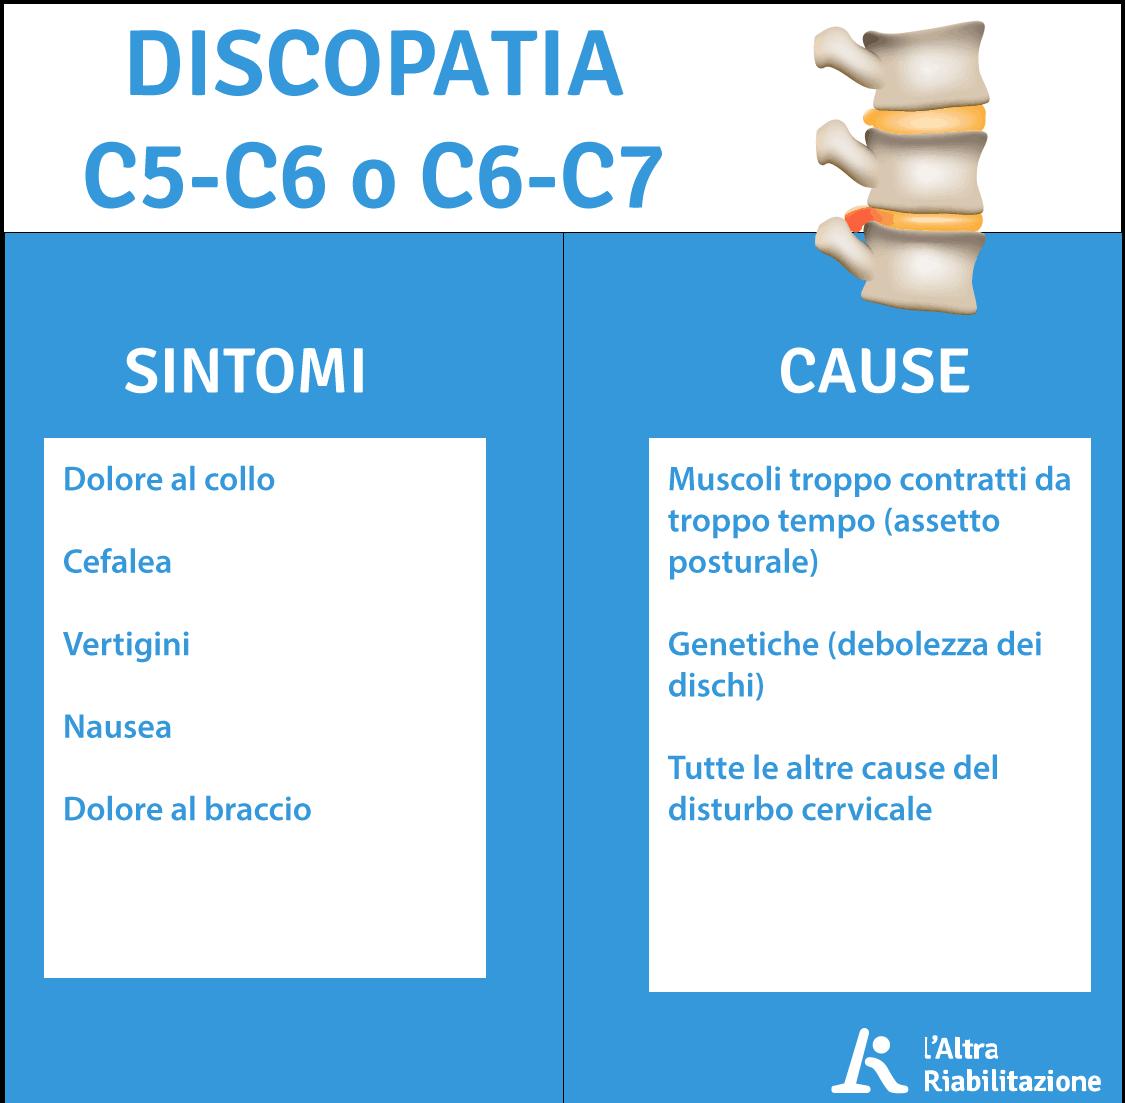 Discopatia C5-C6 e C6-C7: sintomi e cause